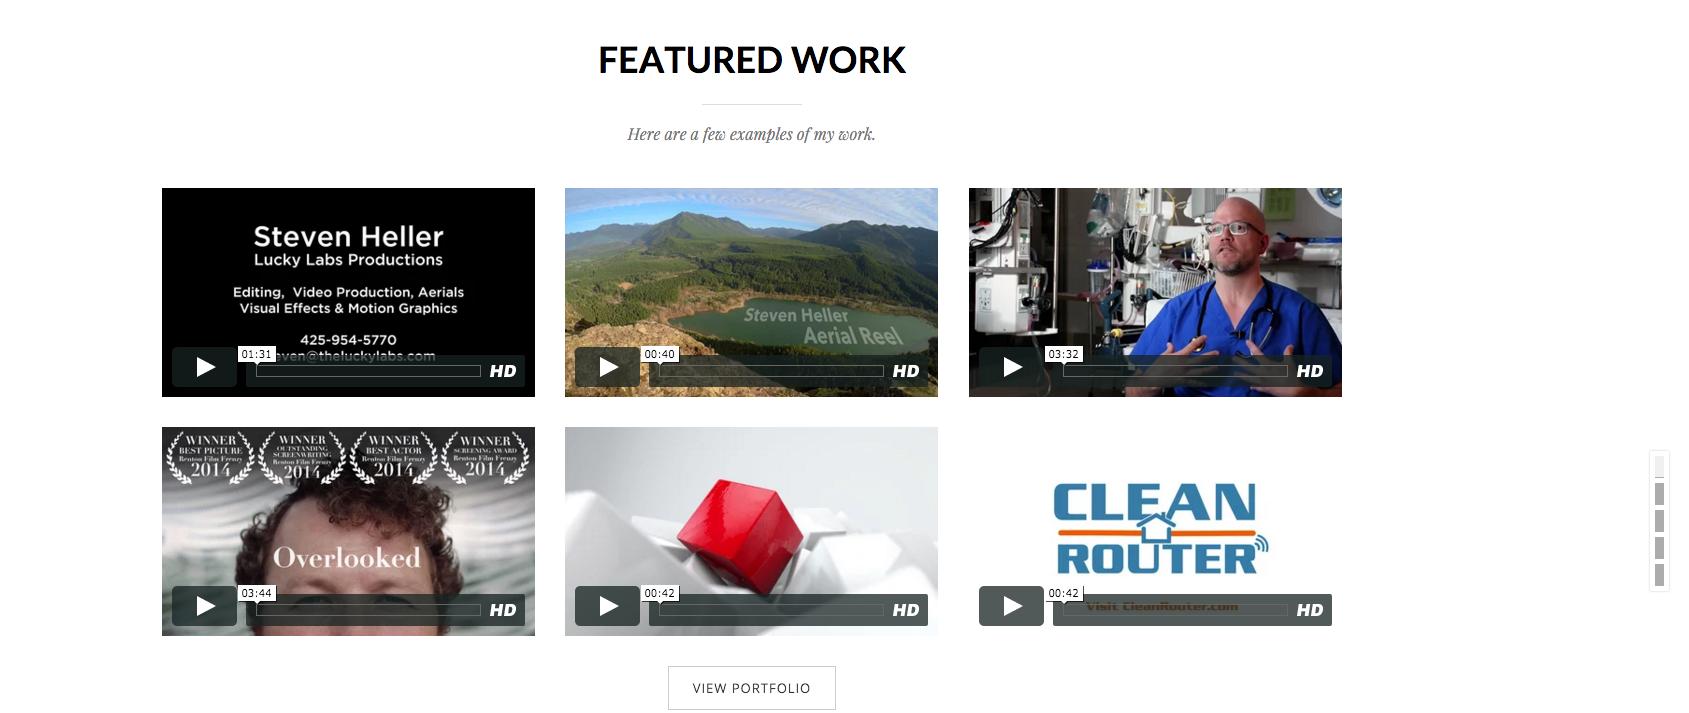 Vimeo blocks